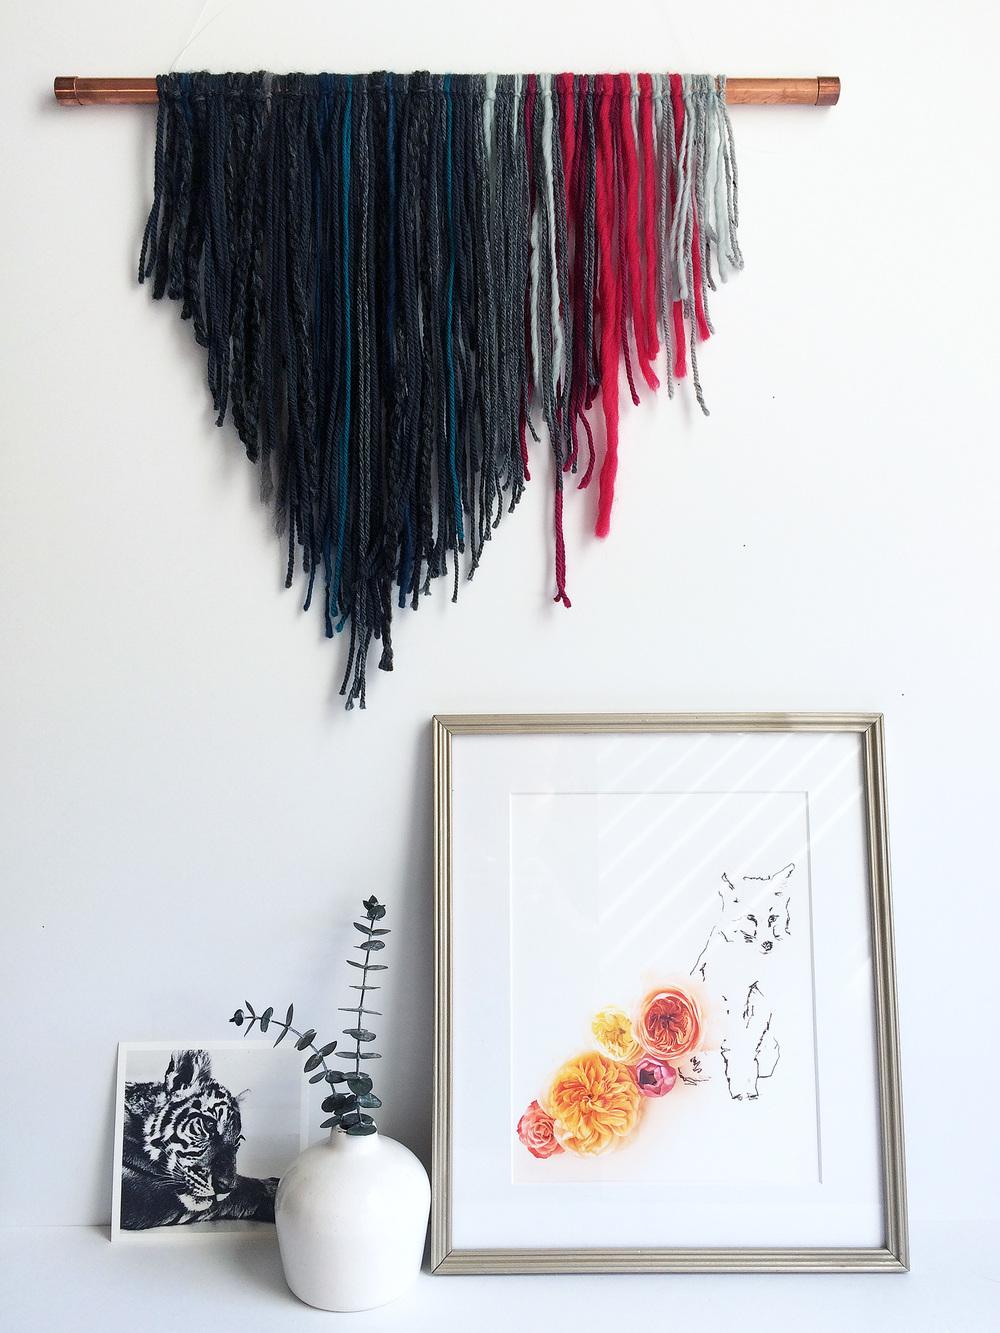 fiber hanging no. 5